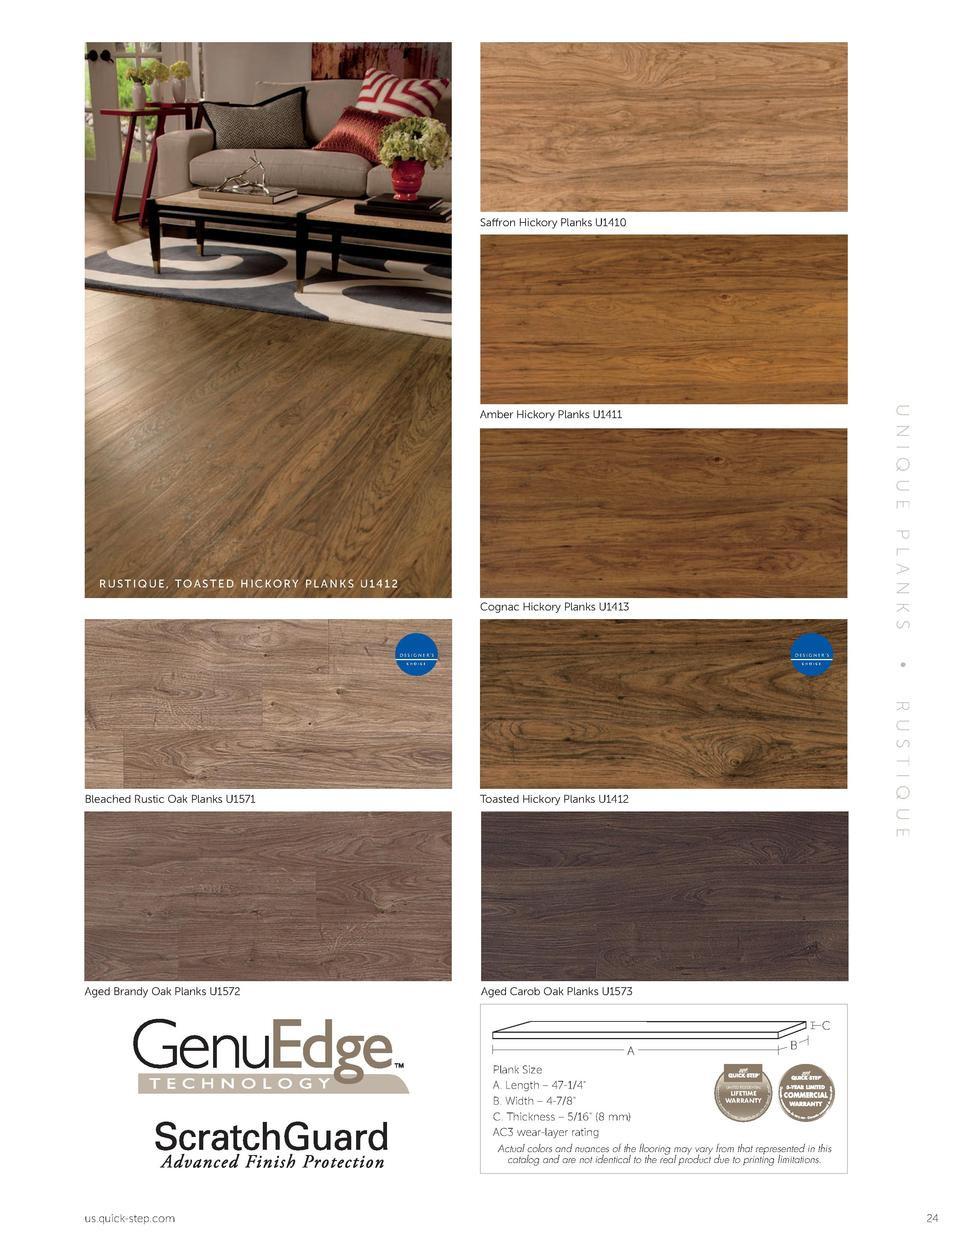 hardwood flooring hickory nc of quick step laminate catalog simplebooklet com pertaining to saffron hickory planks u1410 dark varnished oak planks u1013 amber hickory planks u1411 u ni que